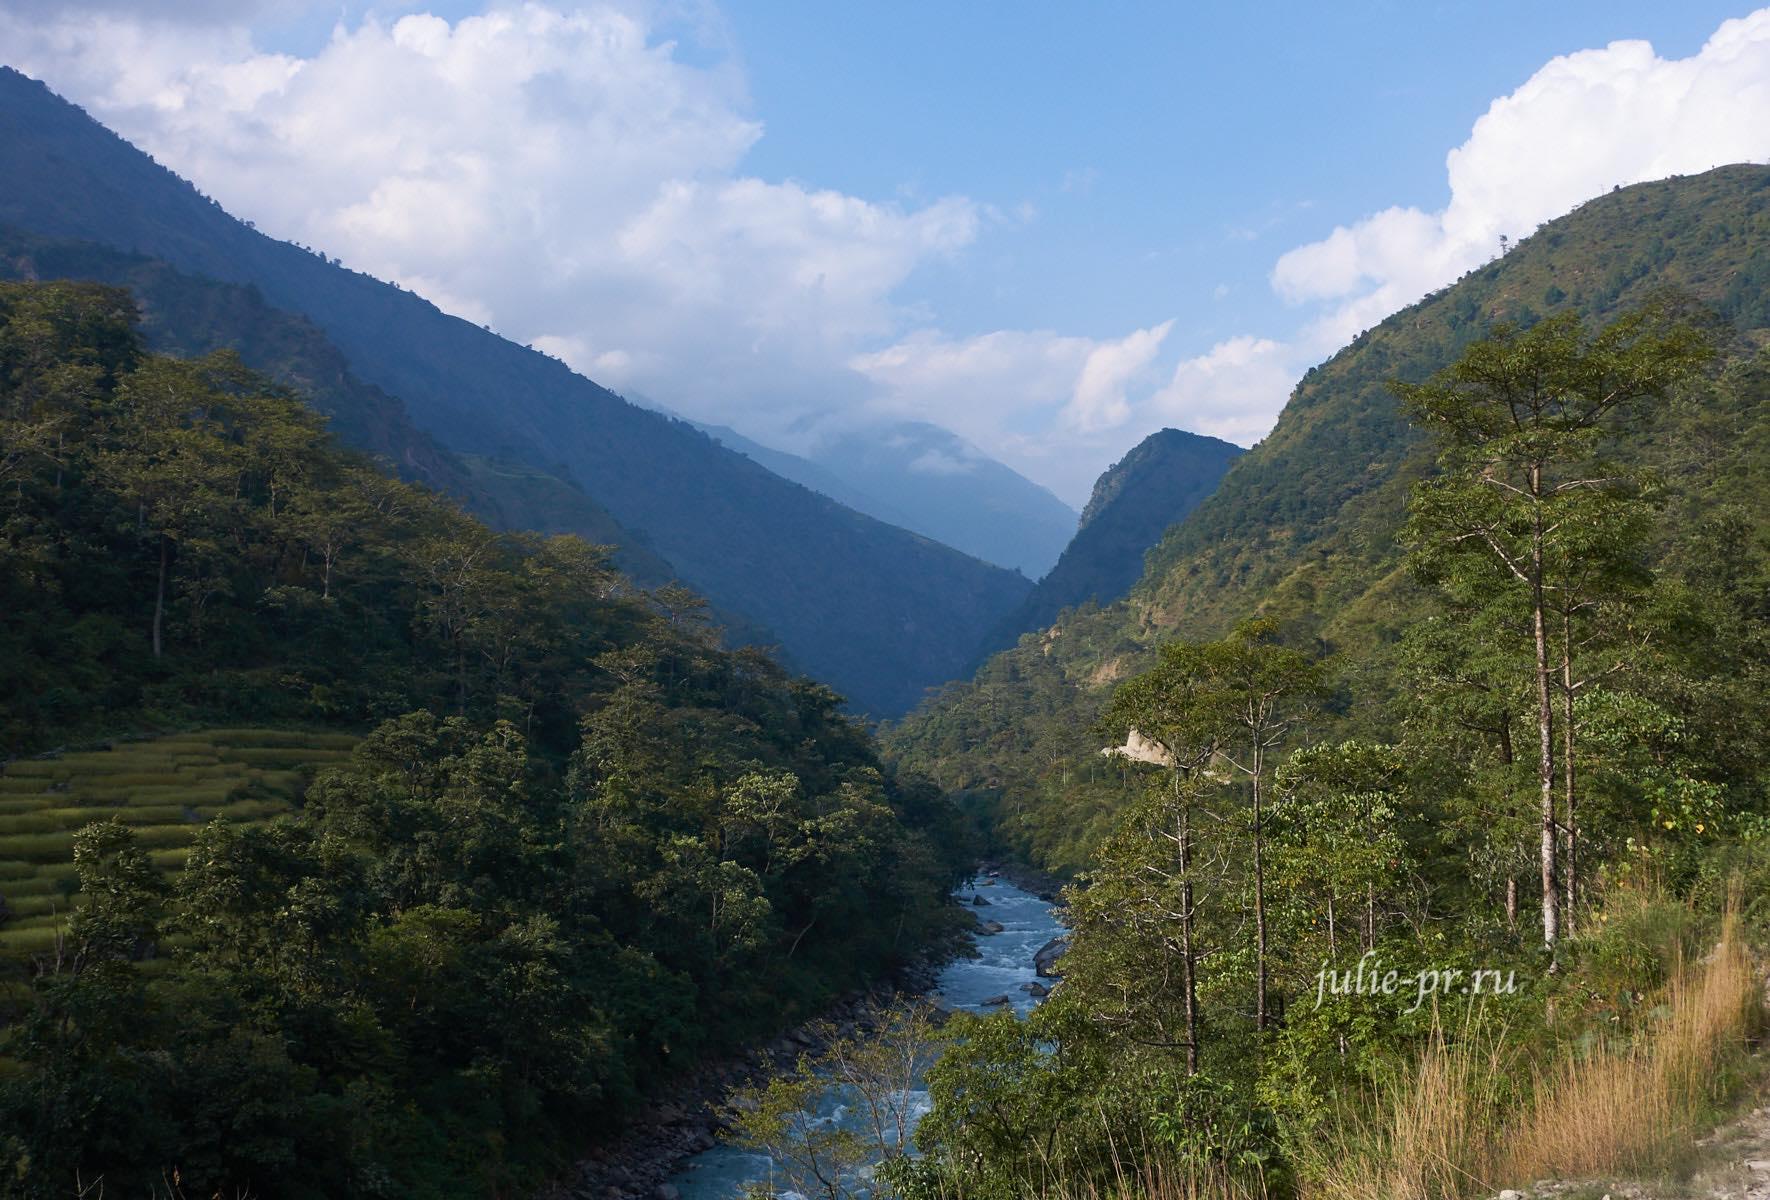 Непал, Аннапурна, река Марсъянди